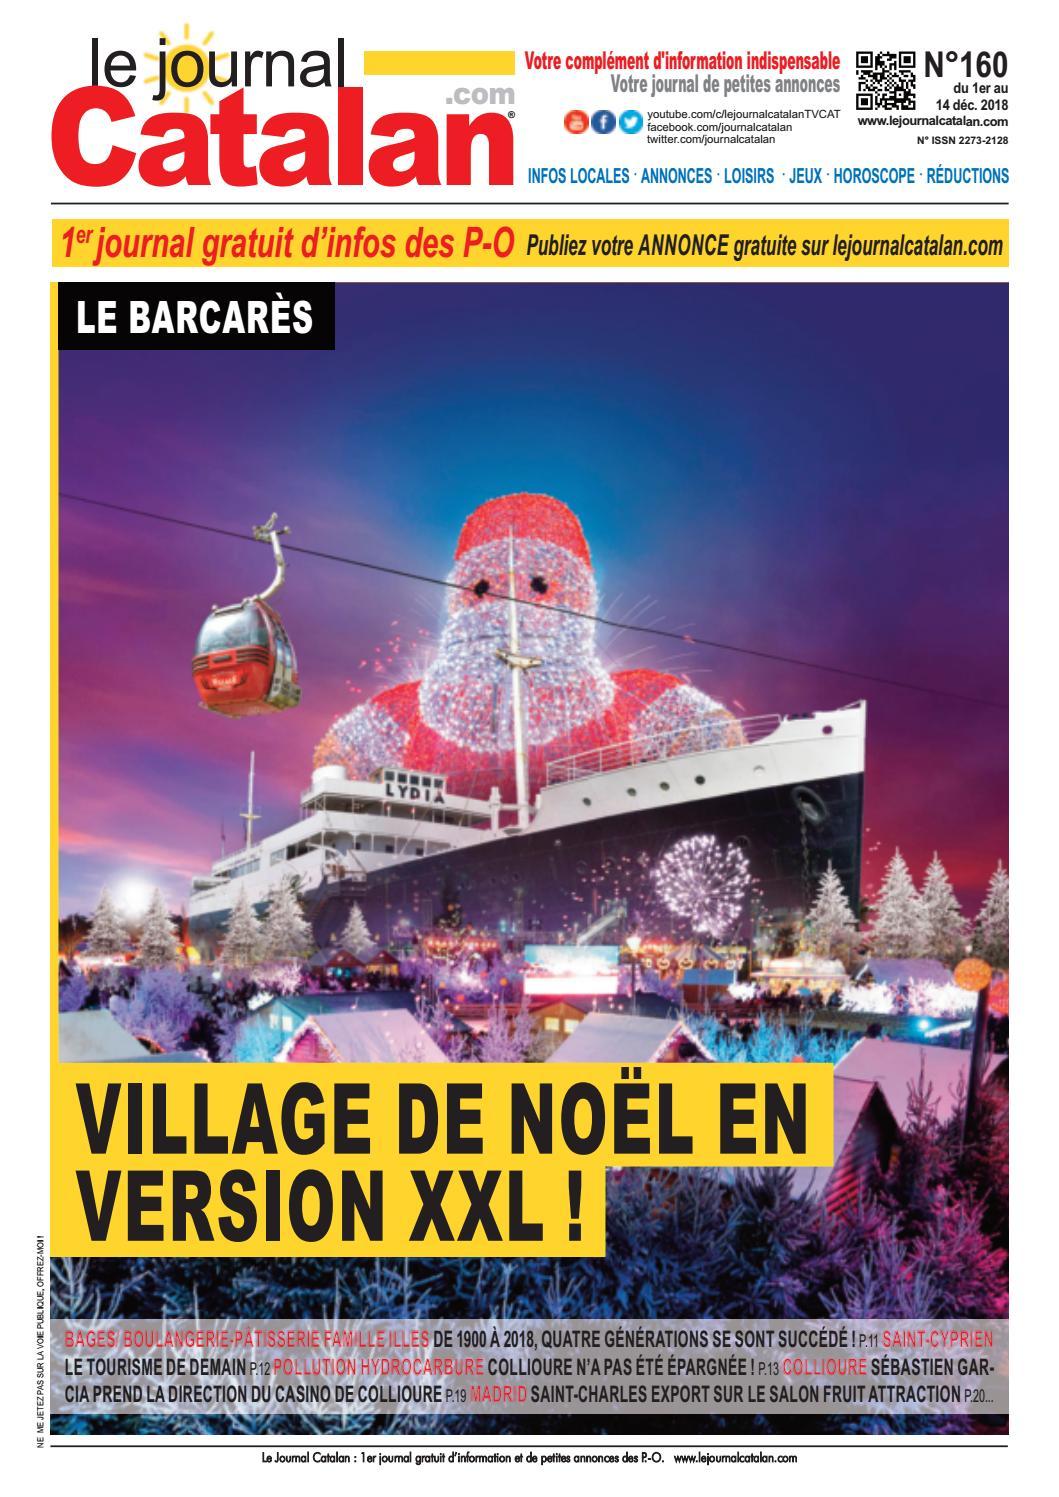 6c5c166c7c6 Le Journal Catalan N ° 160 - Pyrénées-Orientales by LE JOURNAL CATALAN -  issuu